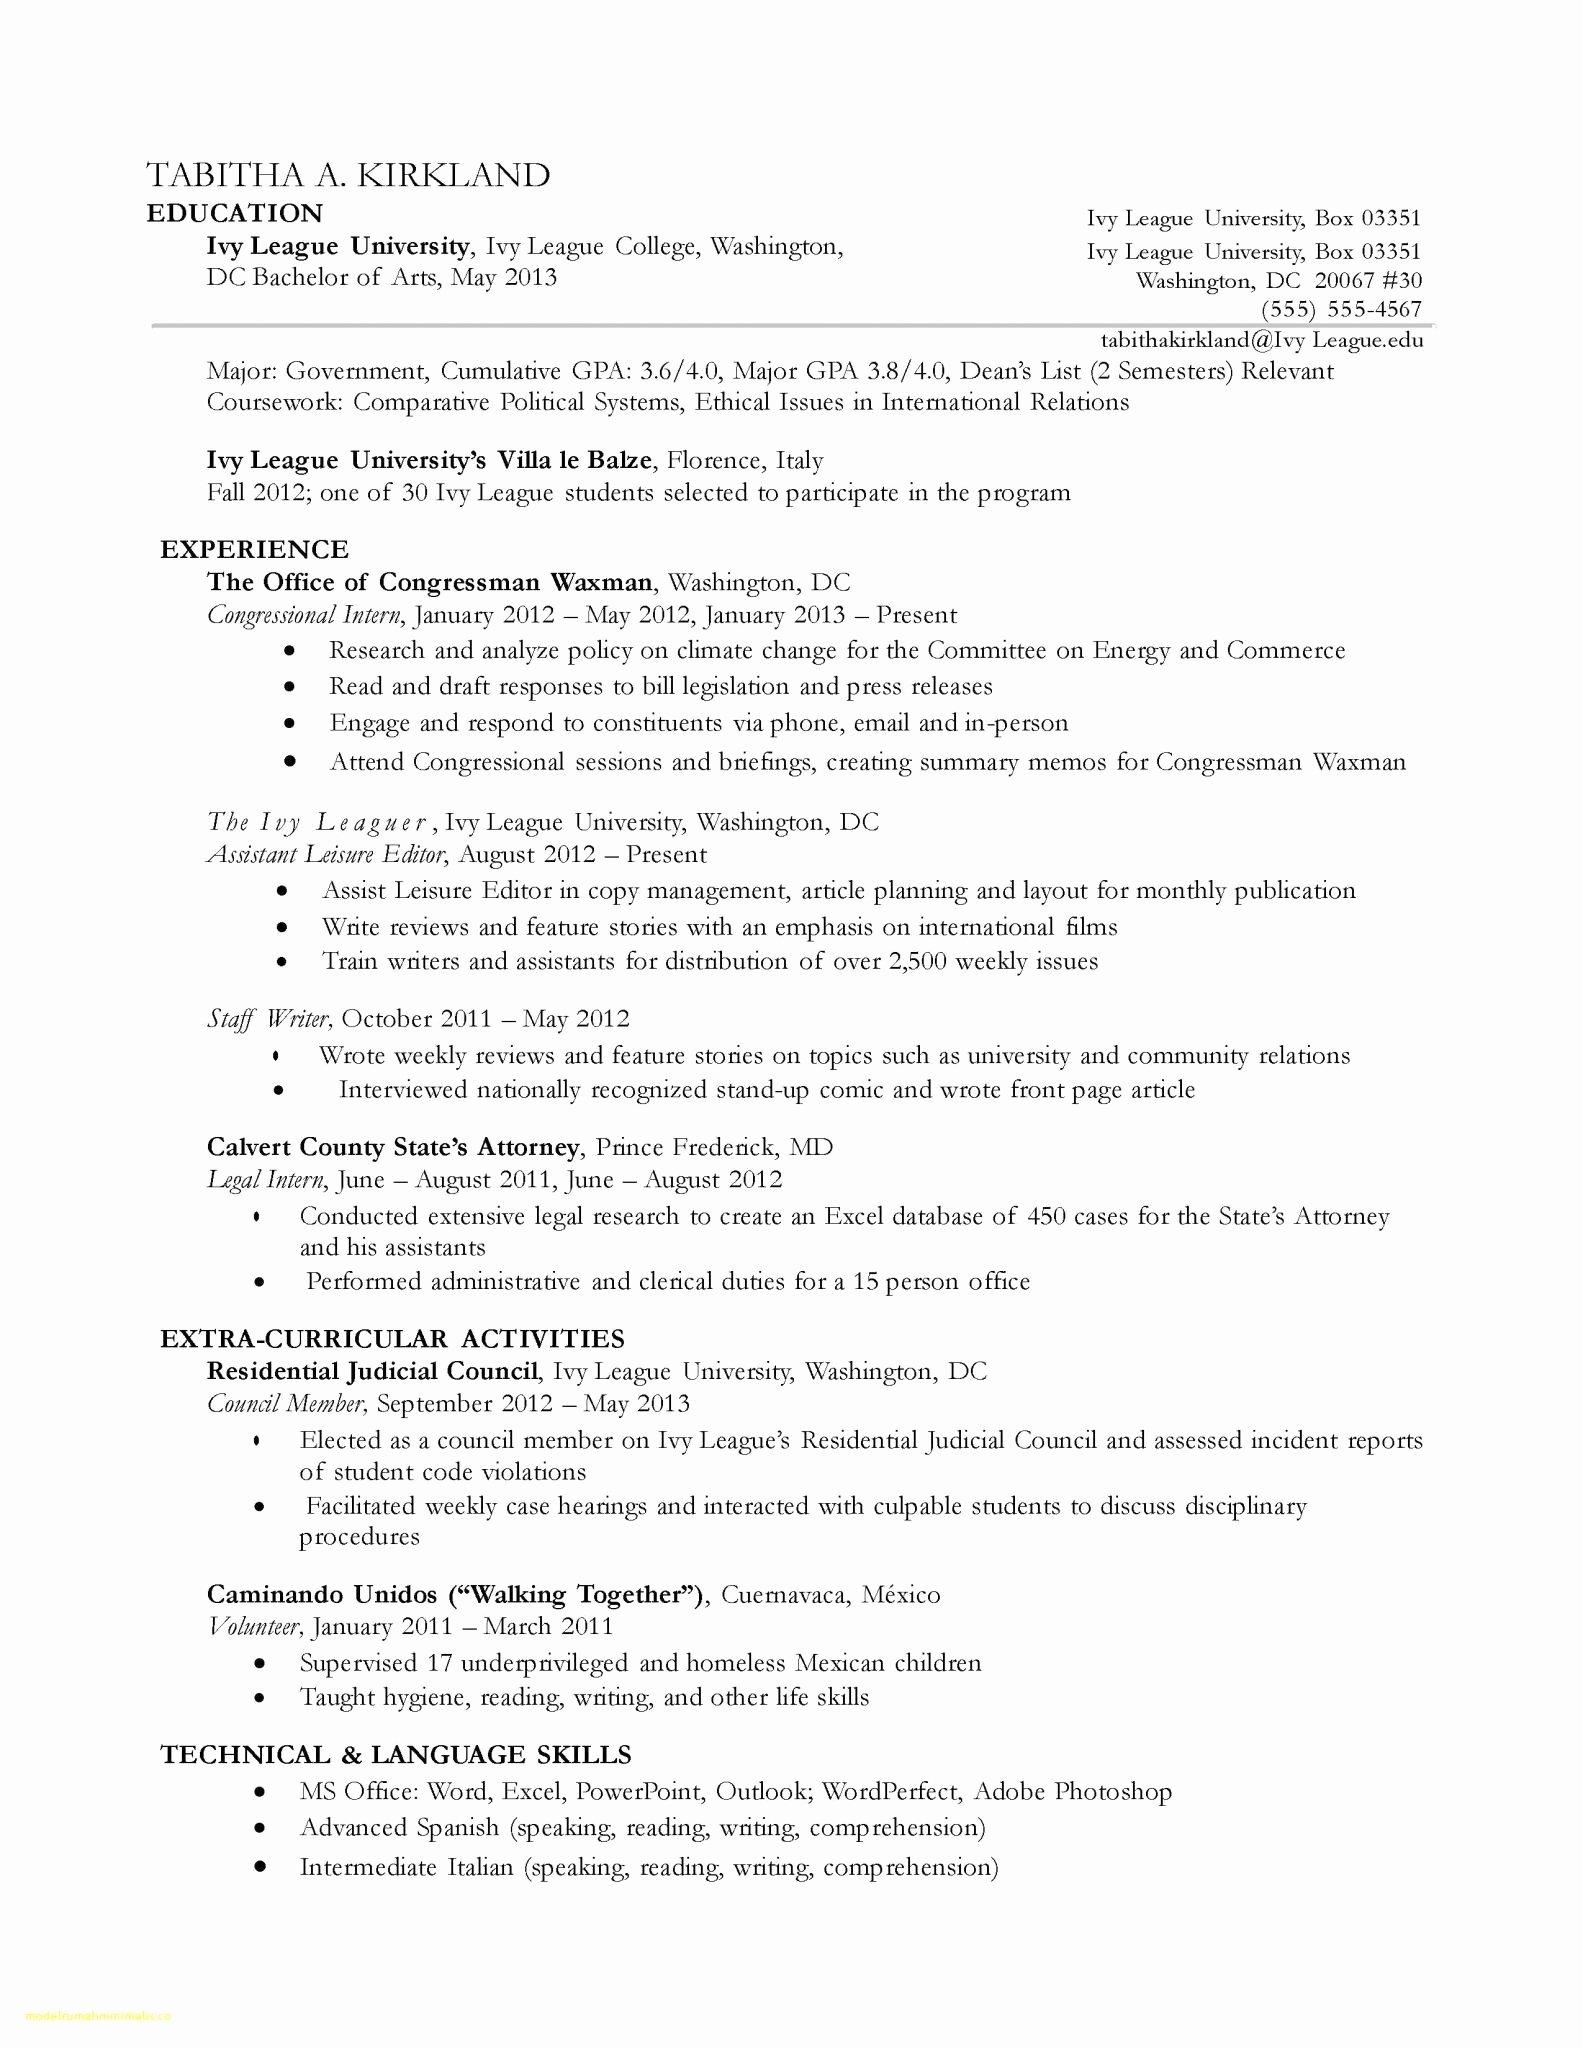 Senate Bill Template Beautiful Legal Case Management Excel Template